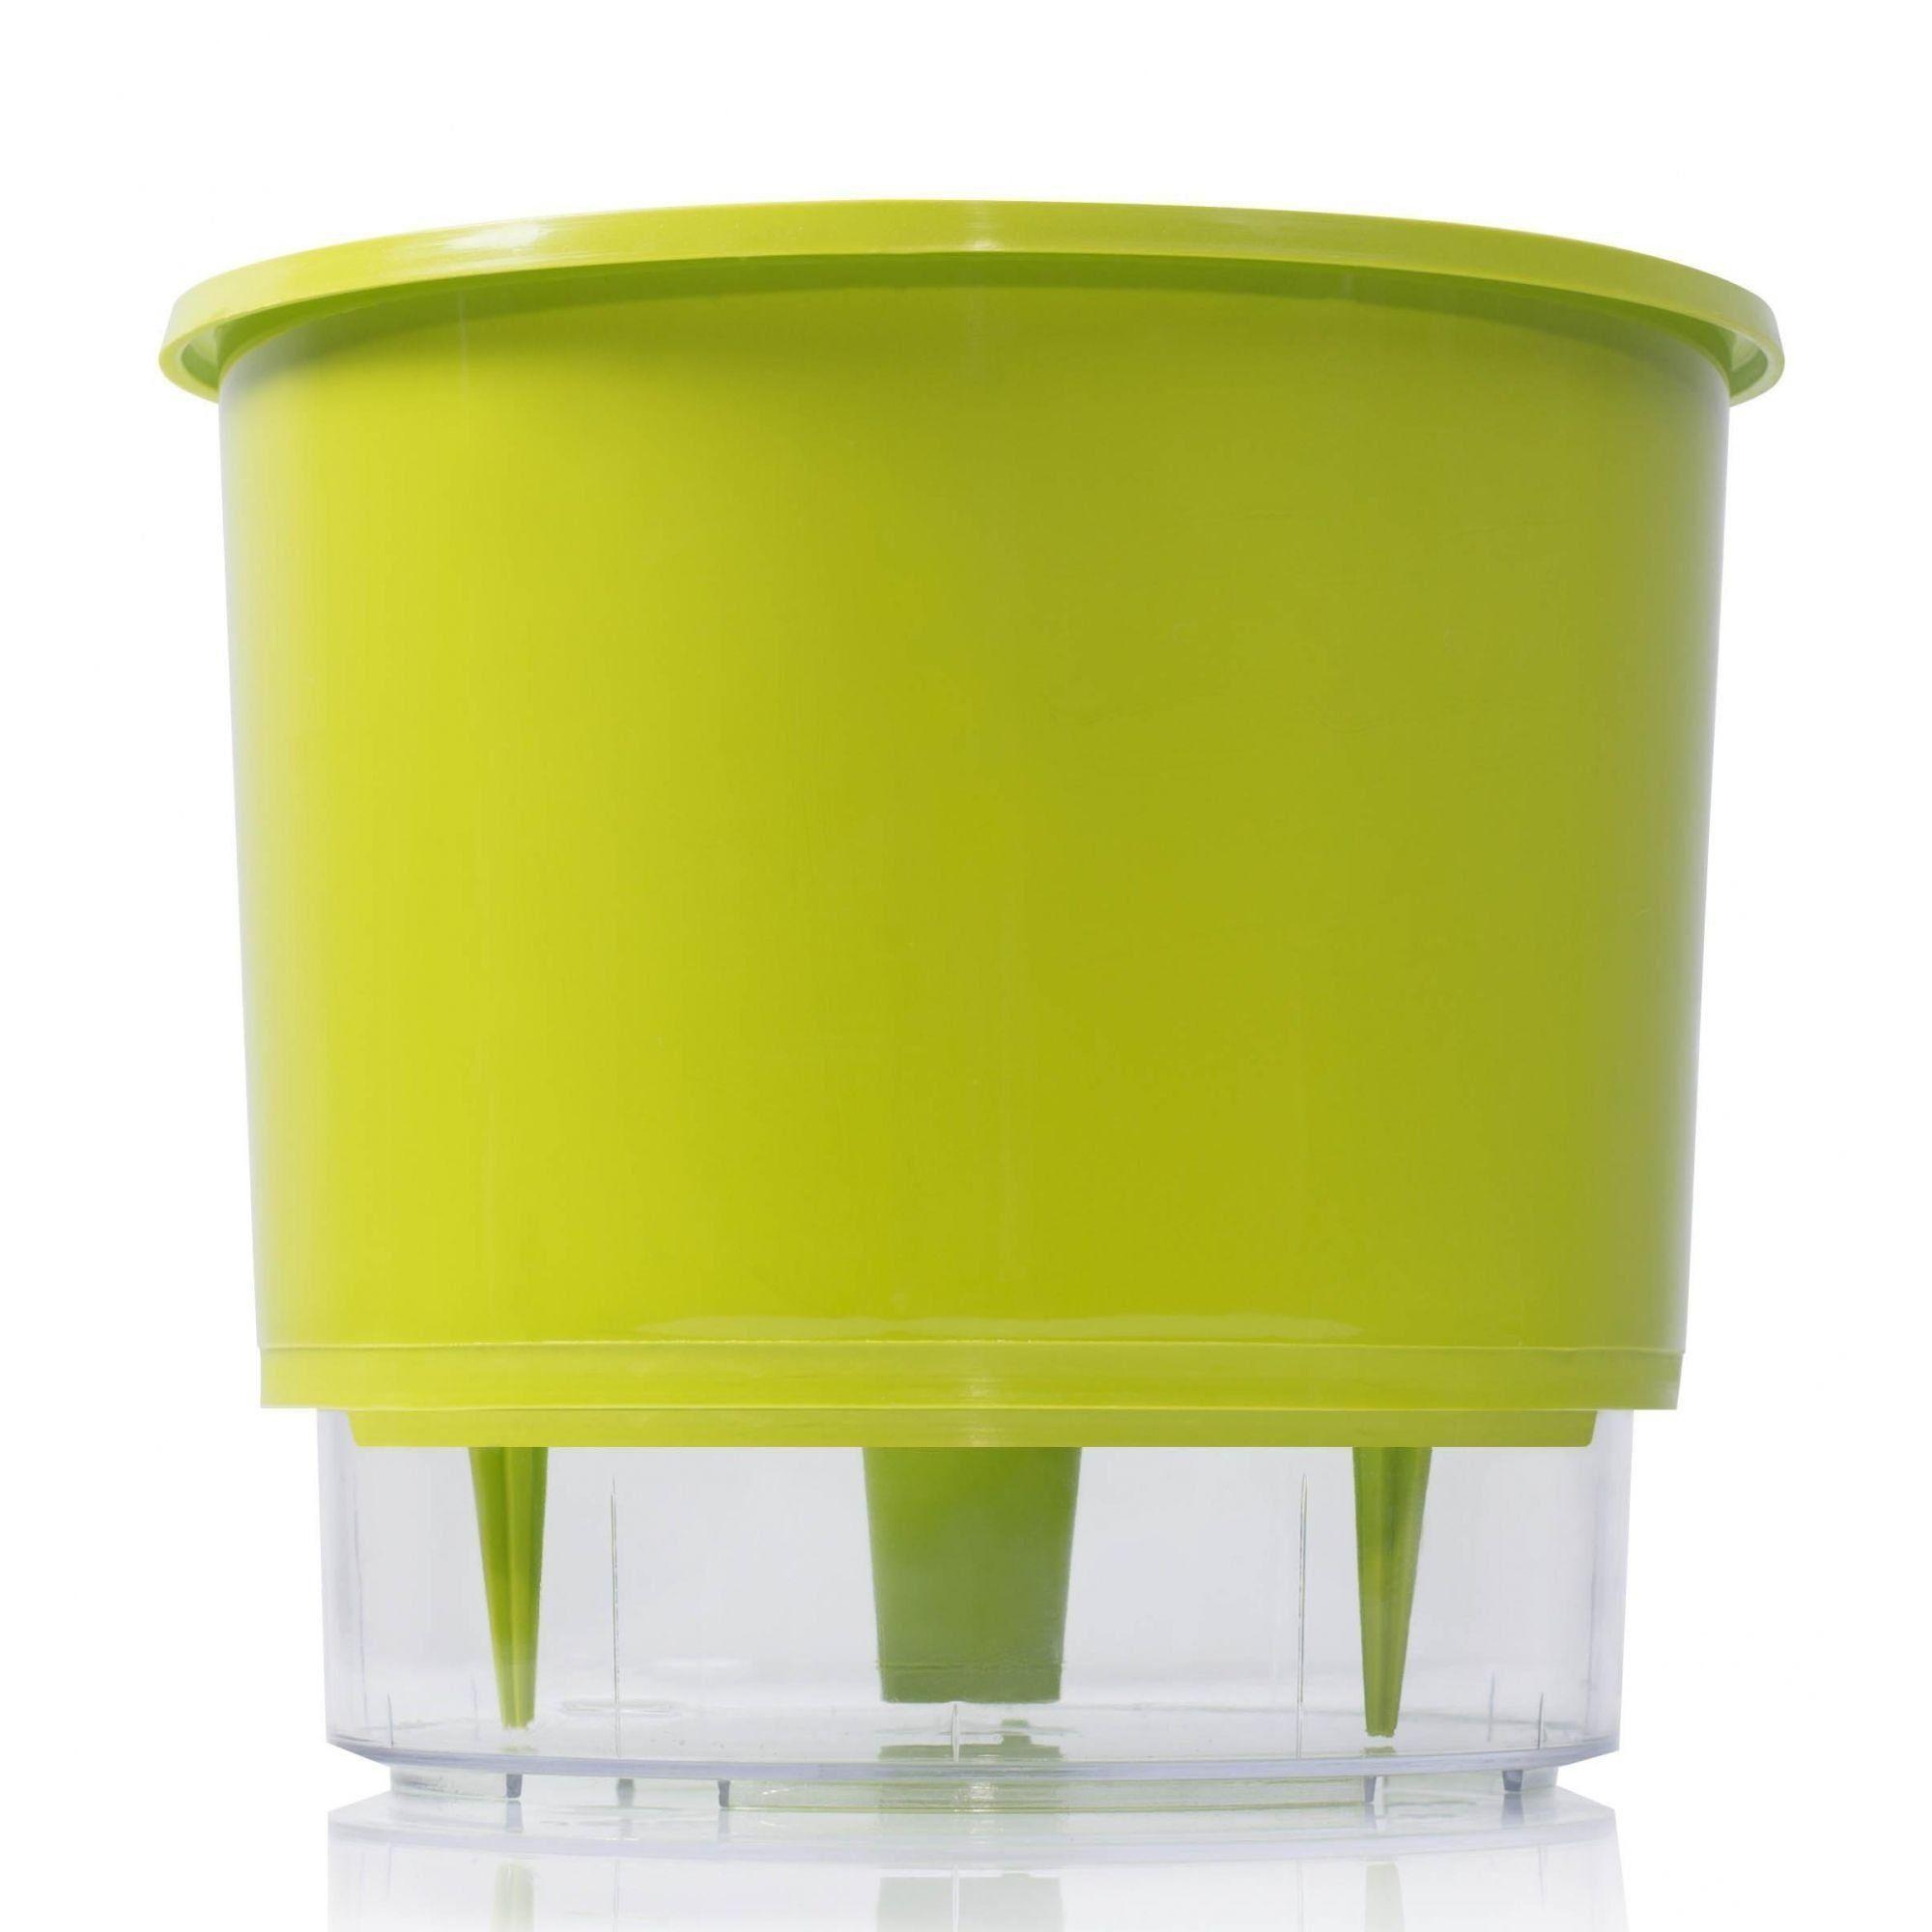 Vaso auto irrigável Raiz MÉDIO N03 16 cm X 14 cm Verde Claro